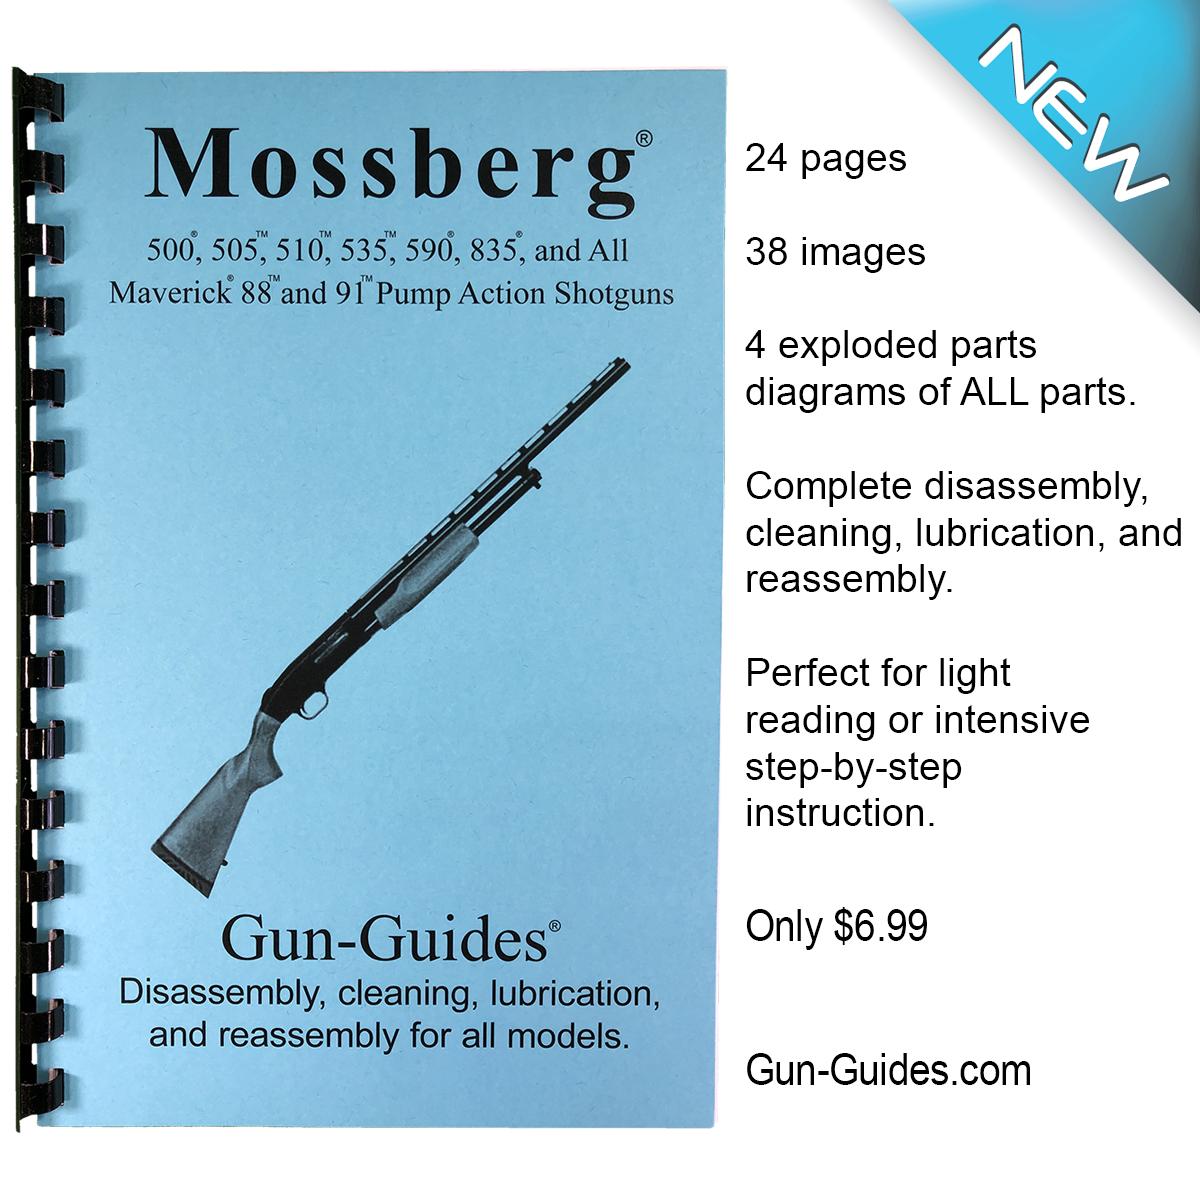 Mossberg Pump Action Shotguns Gun-Guides® Disassembly & Reassembly for All Models